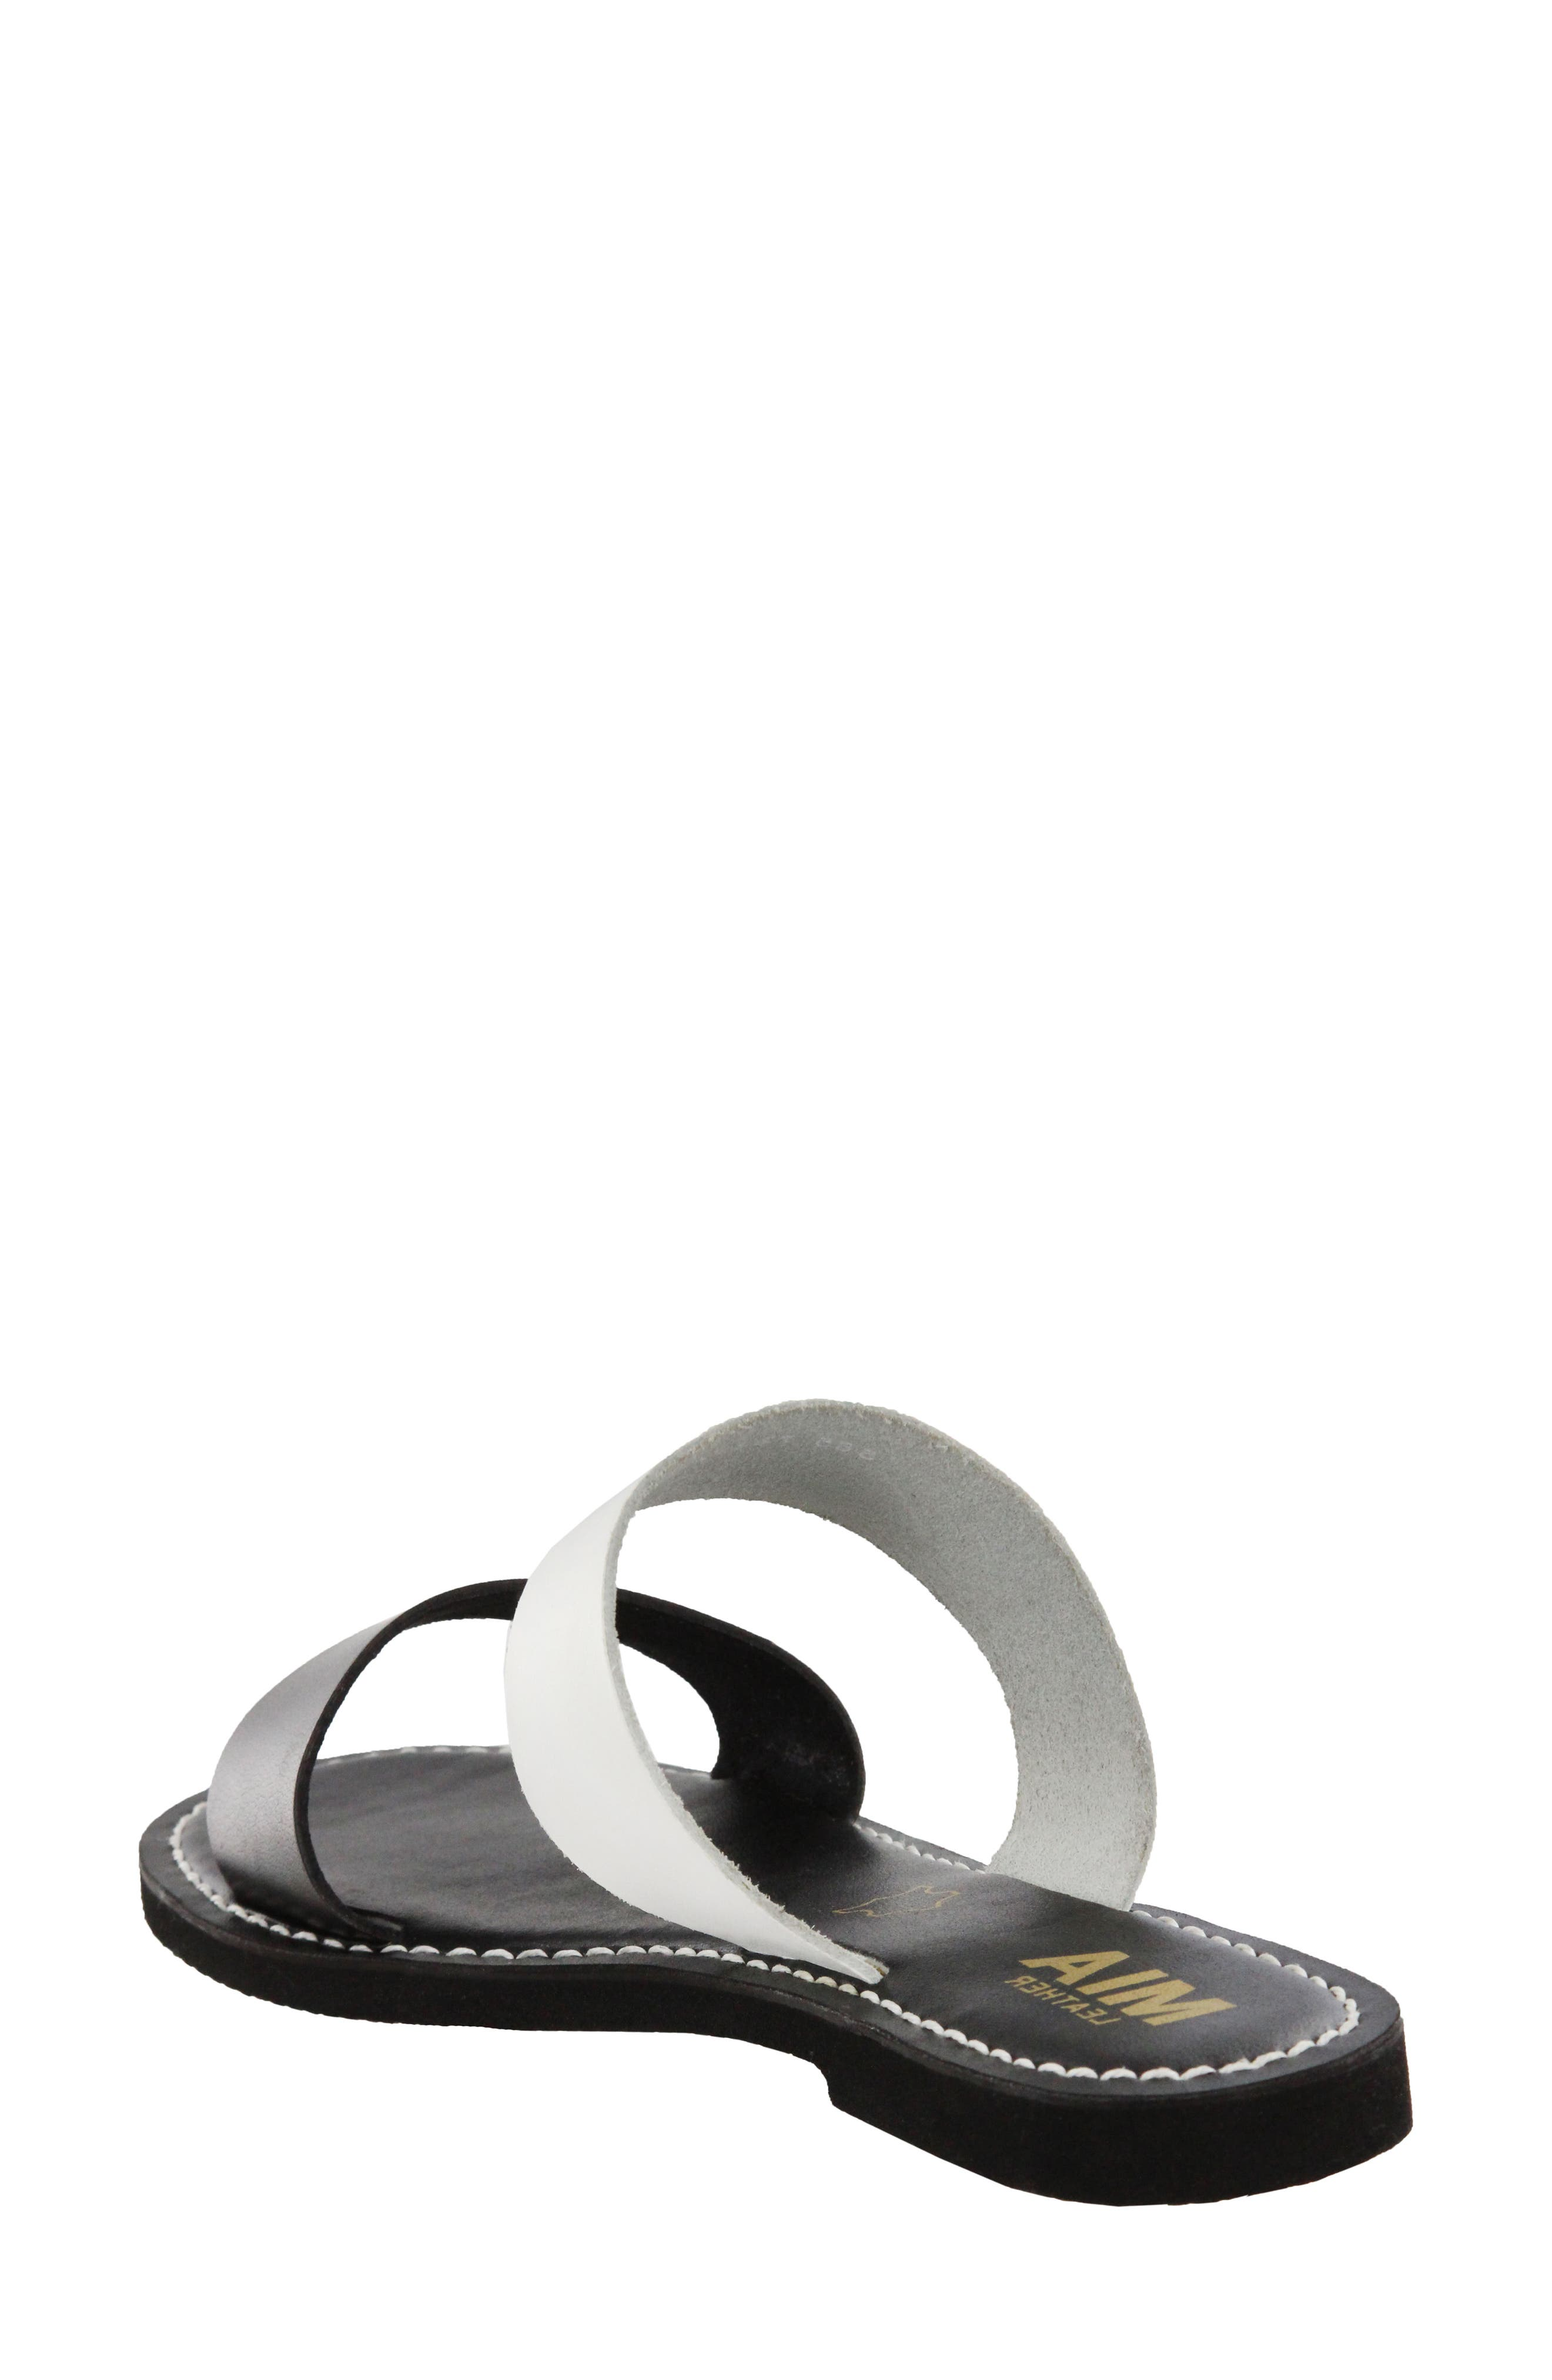 Nila Two-Band Slide Sandal,                             Alternate thumbnail 2, color,                             004